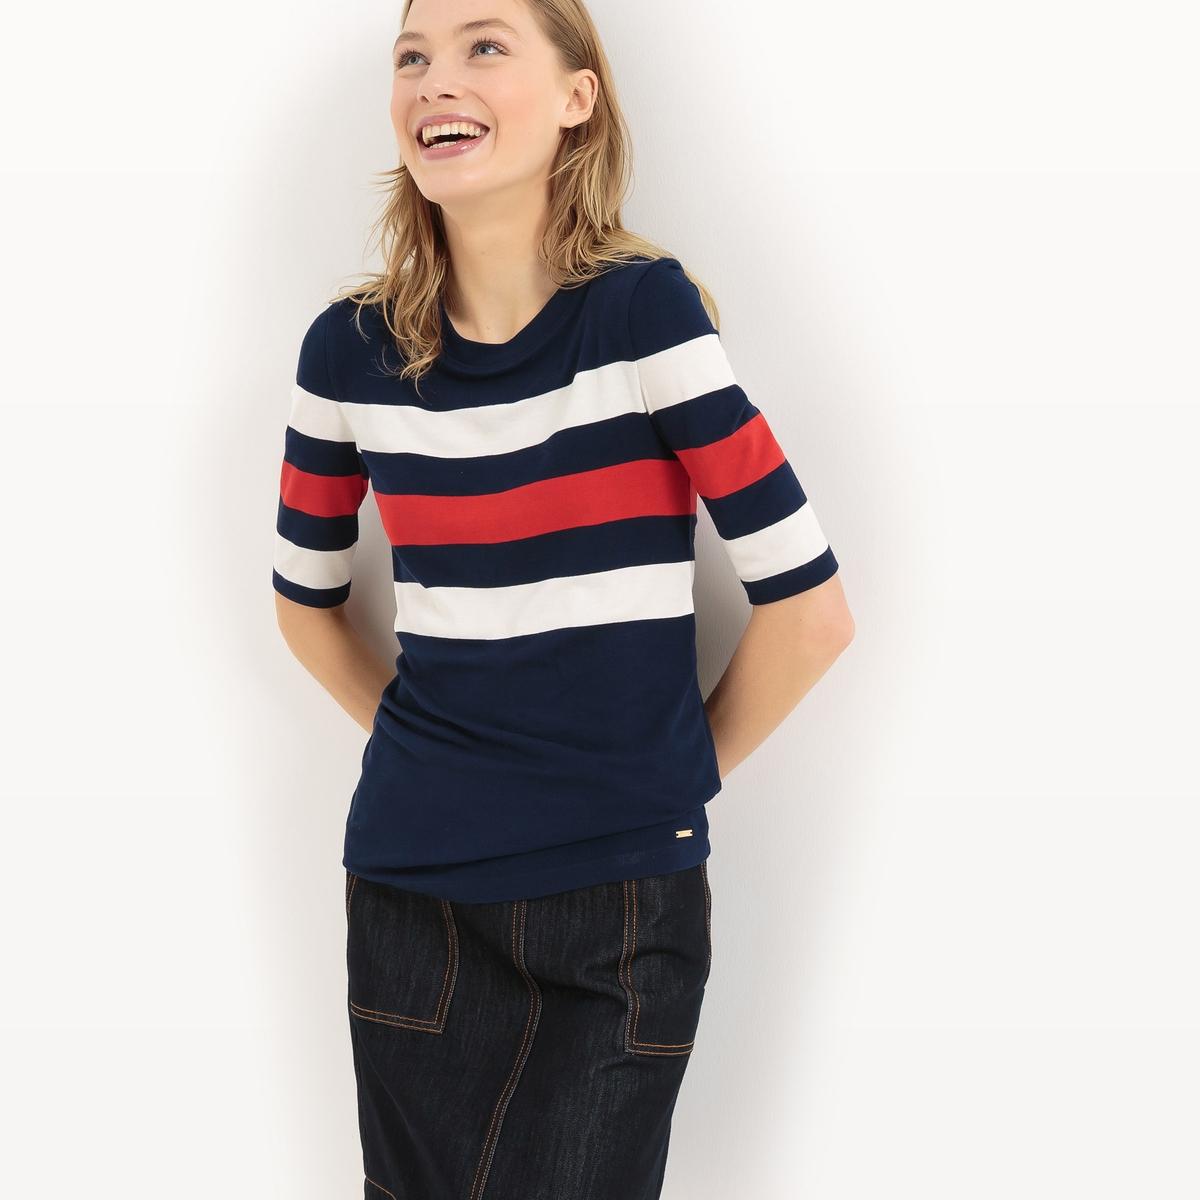 Пуловер из тонкого трикотажа в полоску с короткими рукавами